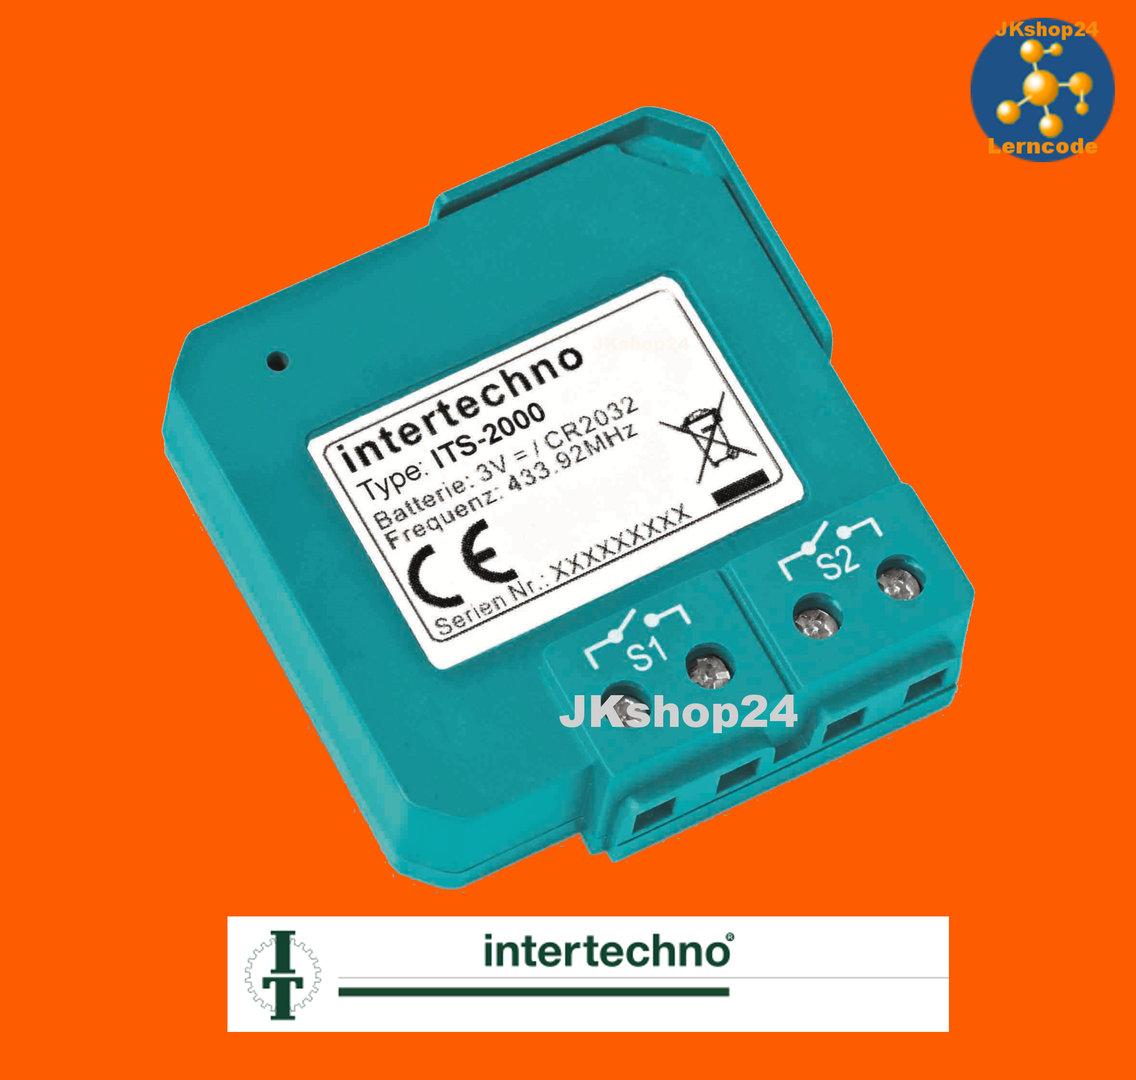 ITS-2000 Funk-Twin-Sender 2-Kanal potentialfrei - www.intertechno.shop